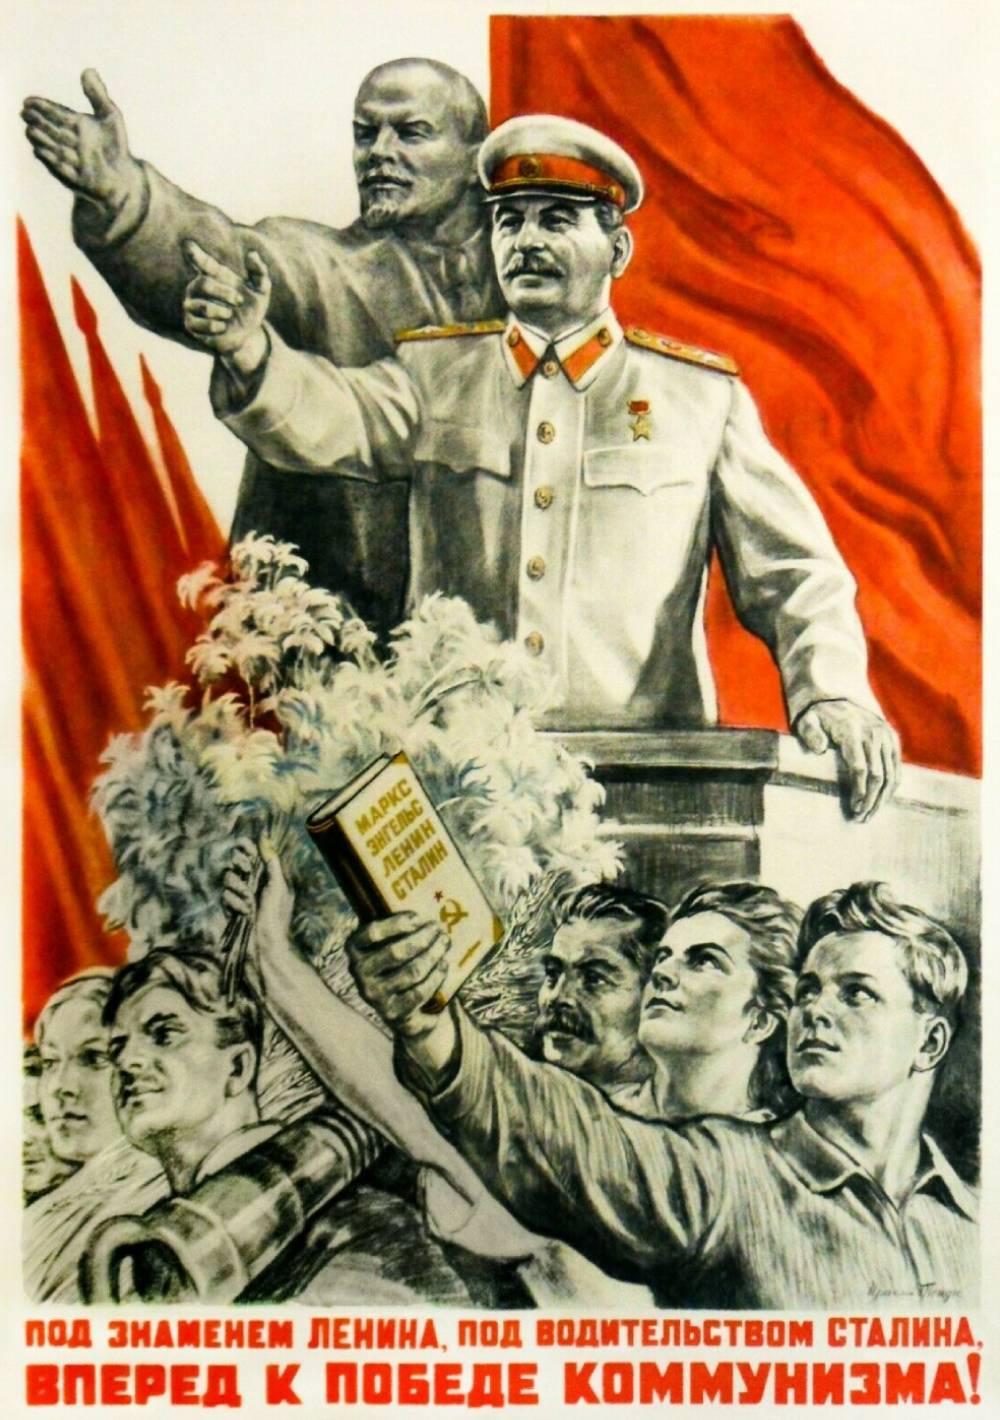 literatura paraibana utopia tirania autoritarismo ditadura sovietica